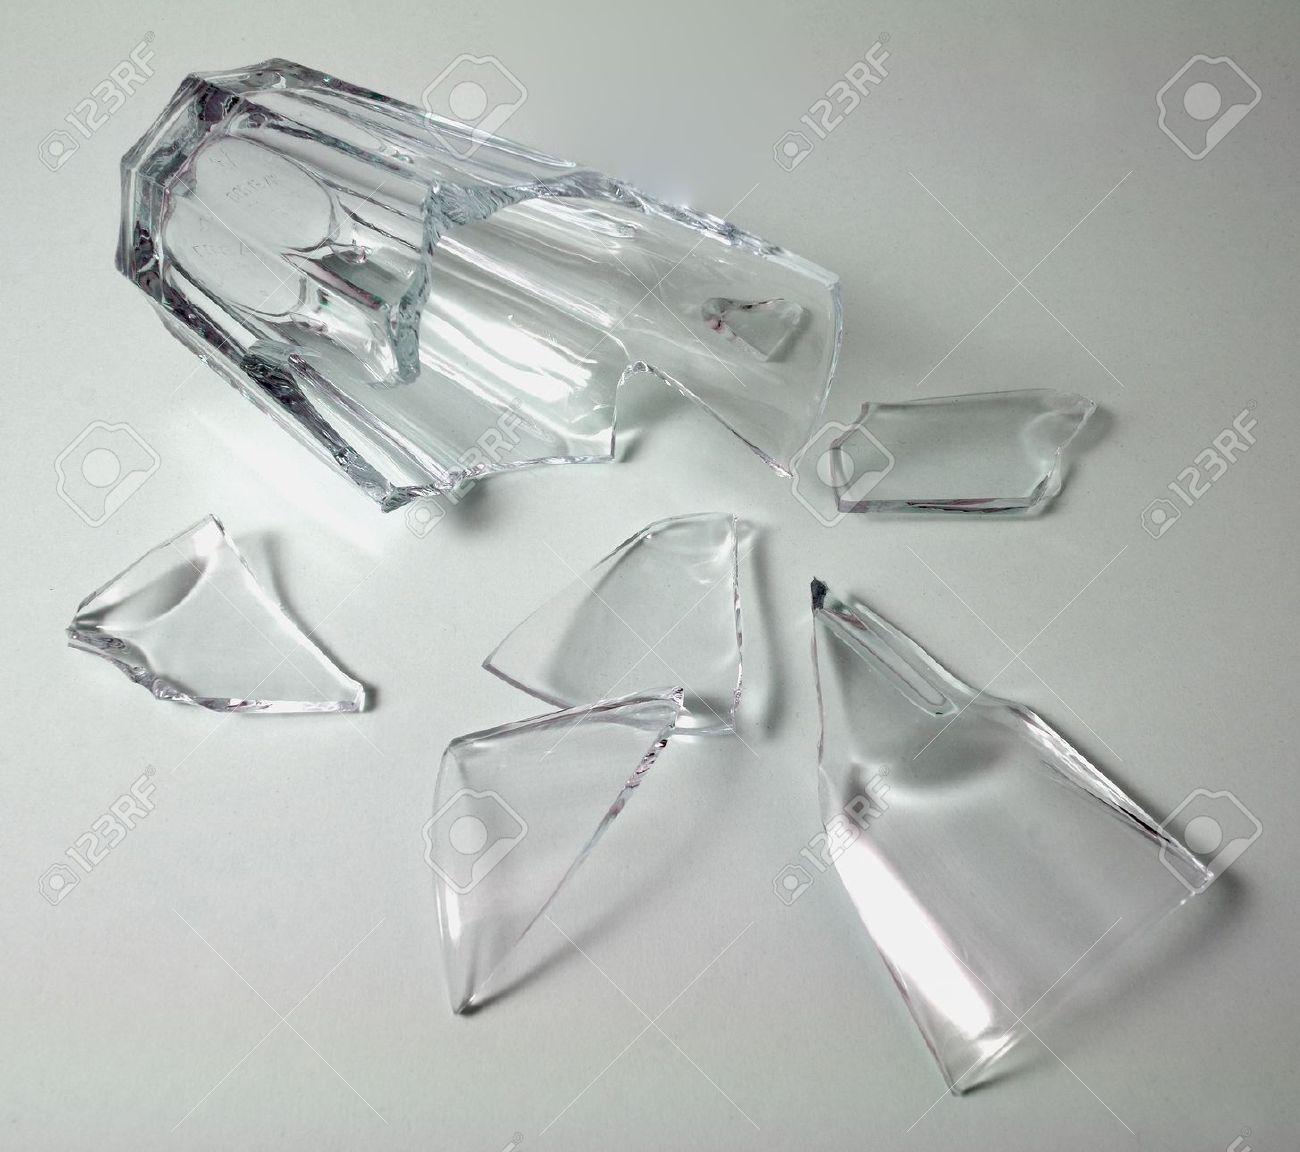 Pin by Joseph Veloz on images Windshield glass, Broken